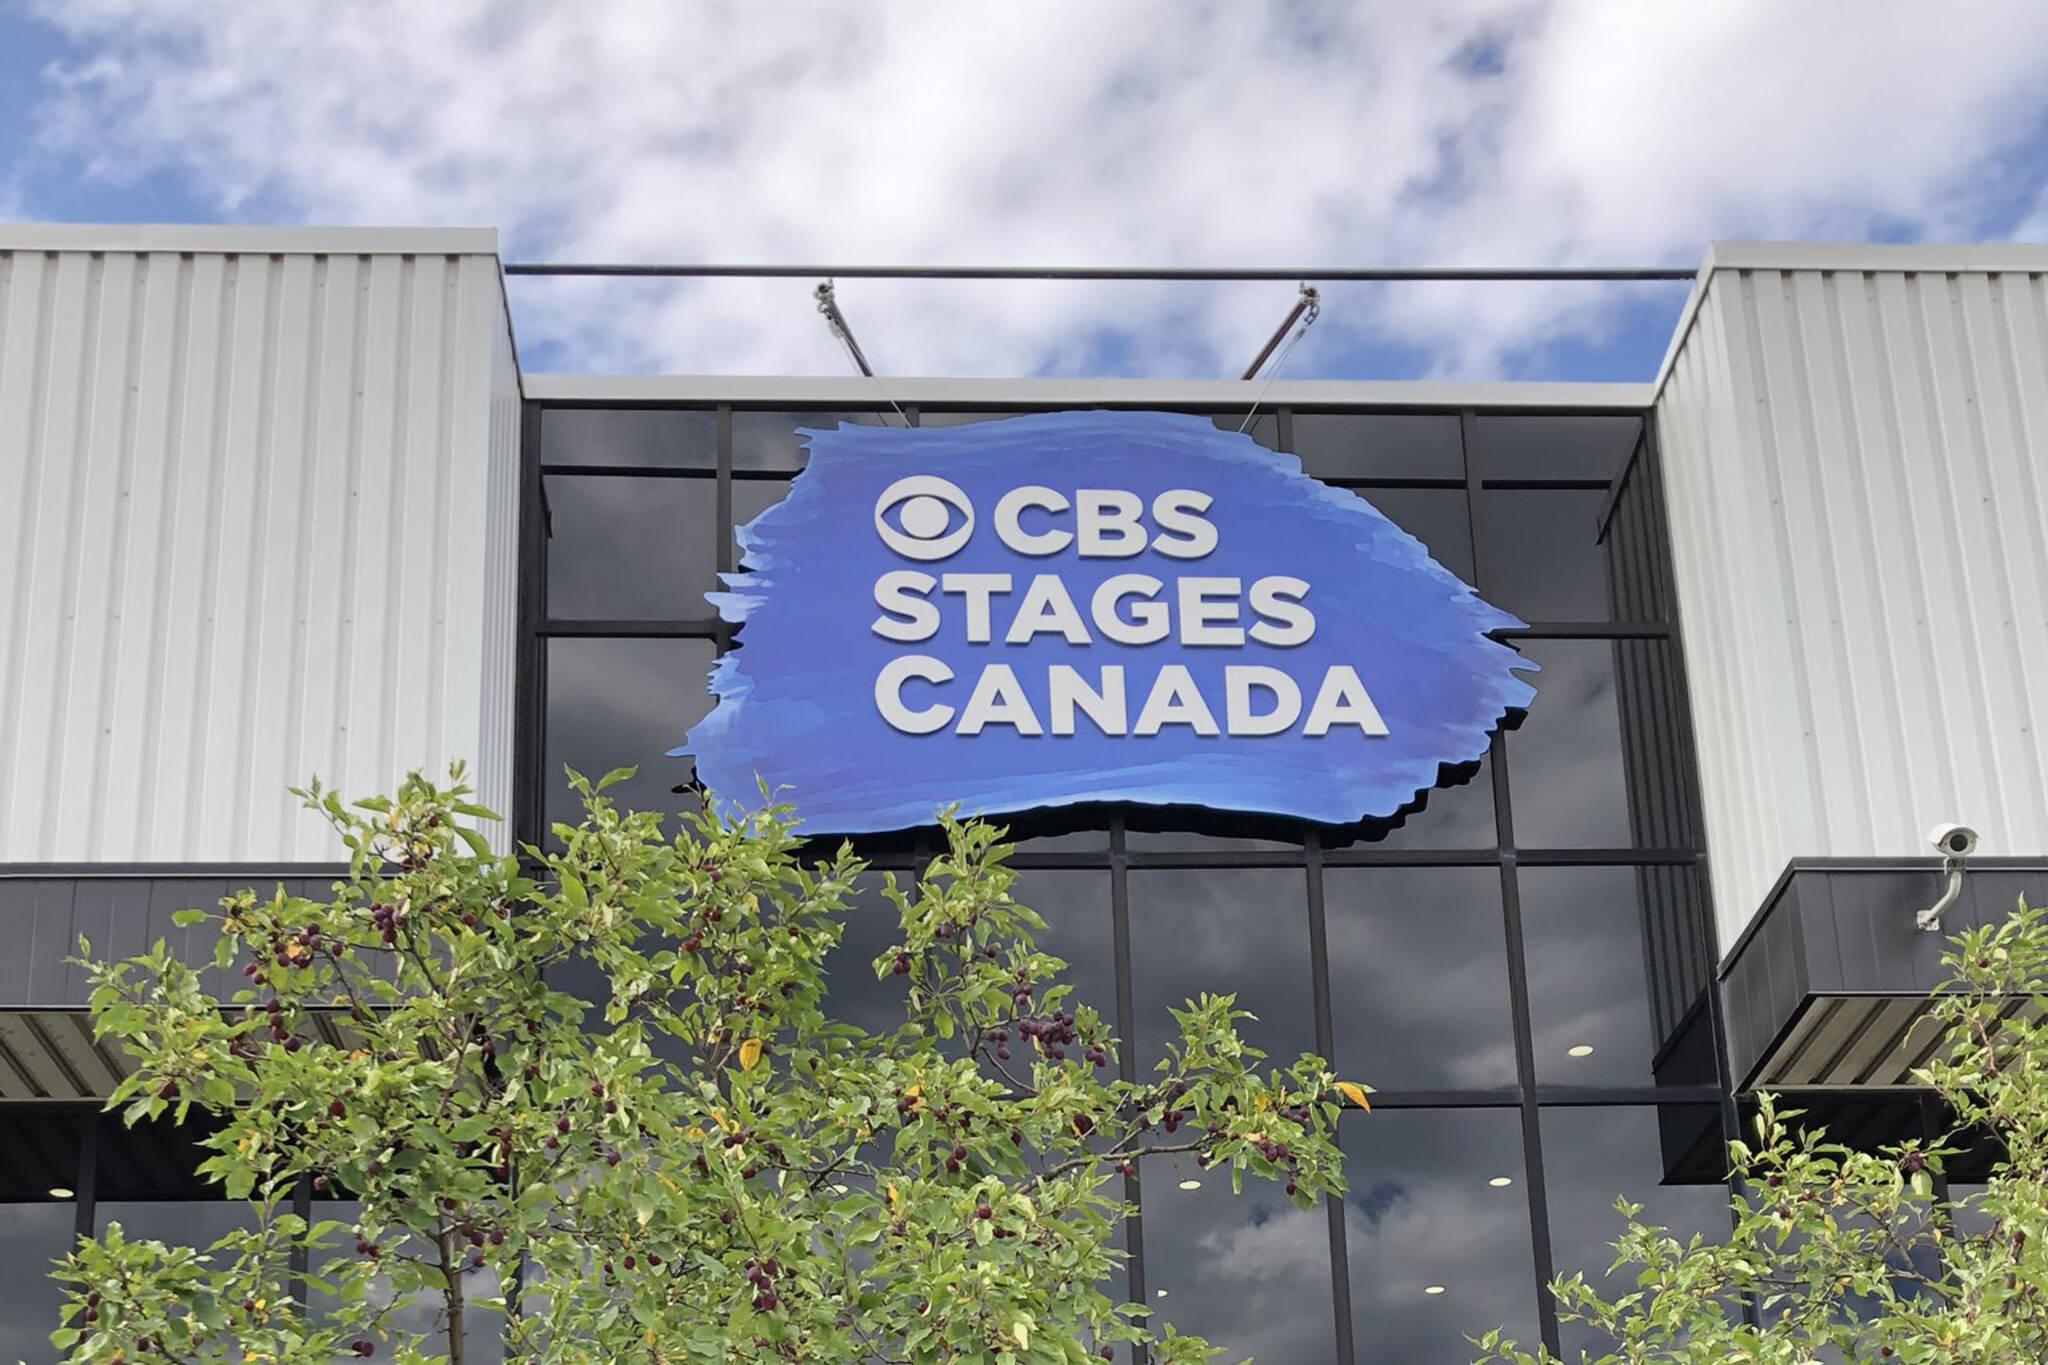 cbs studios canada